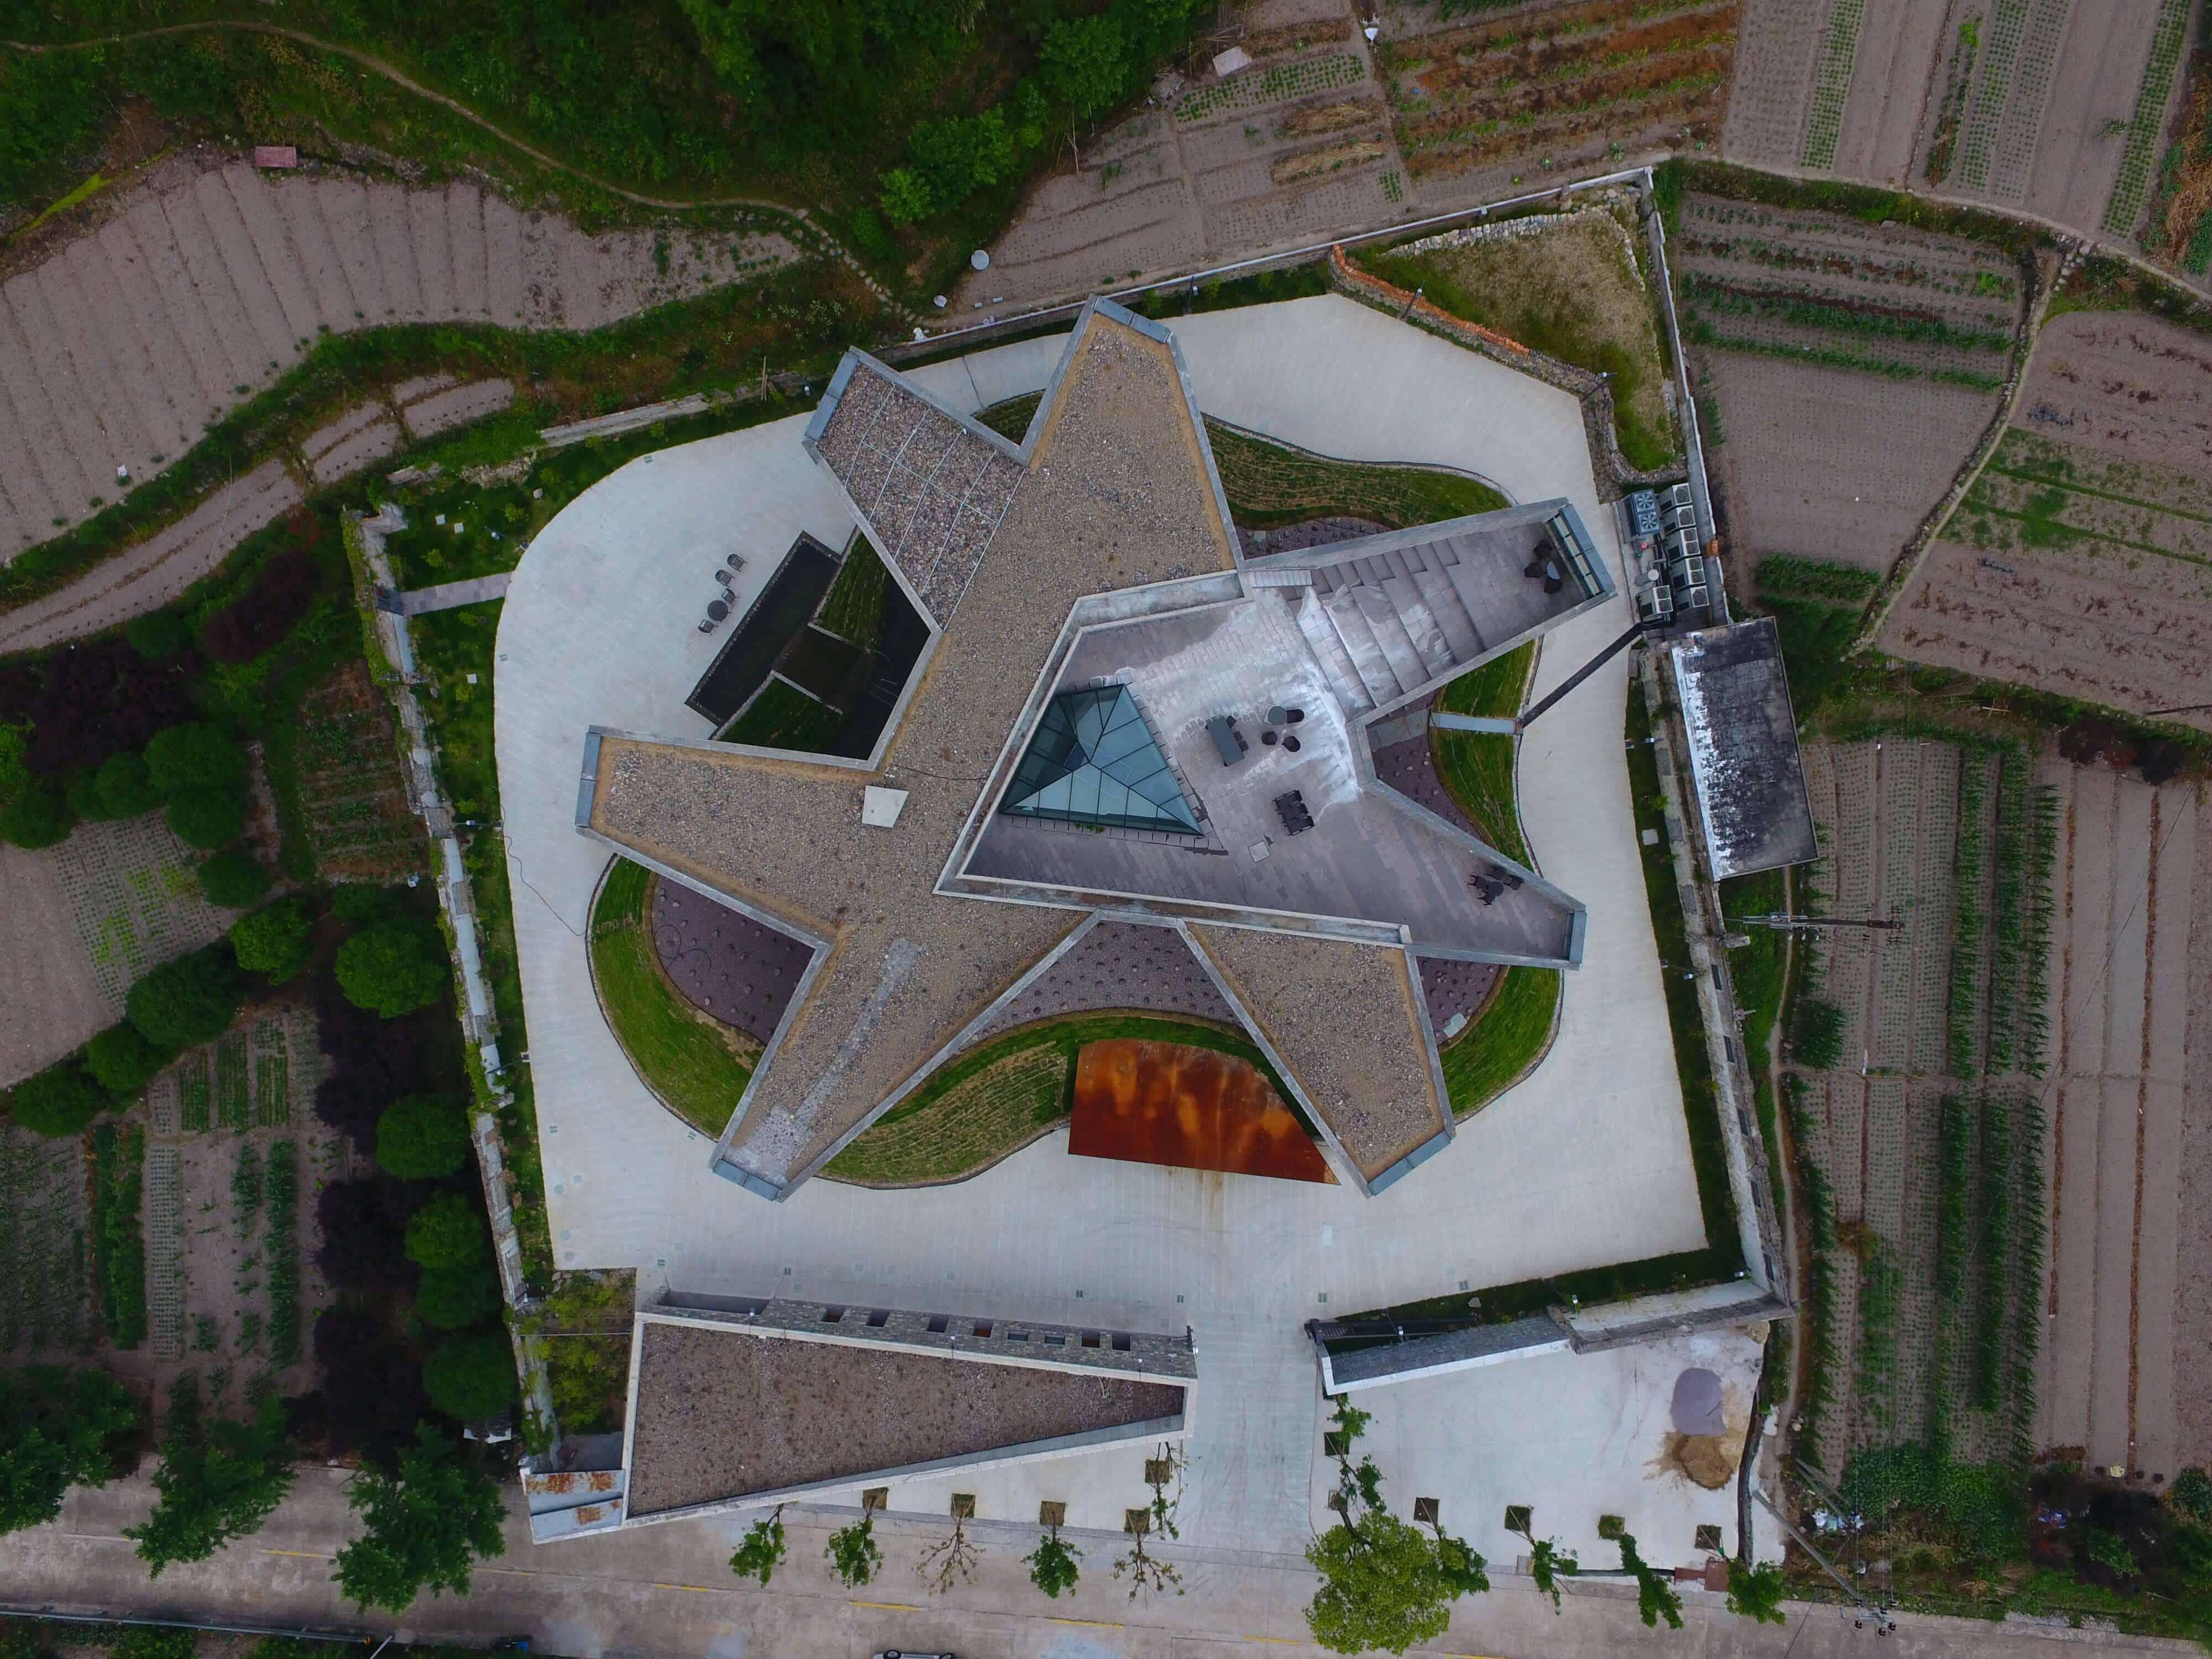 Progetto CMR - Ningbo Duao Art Museum